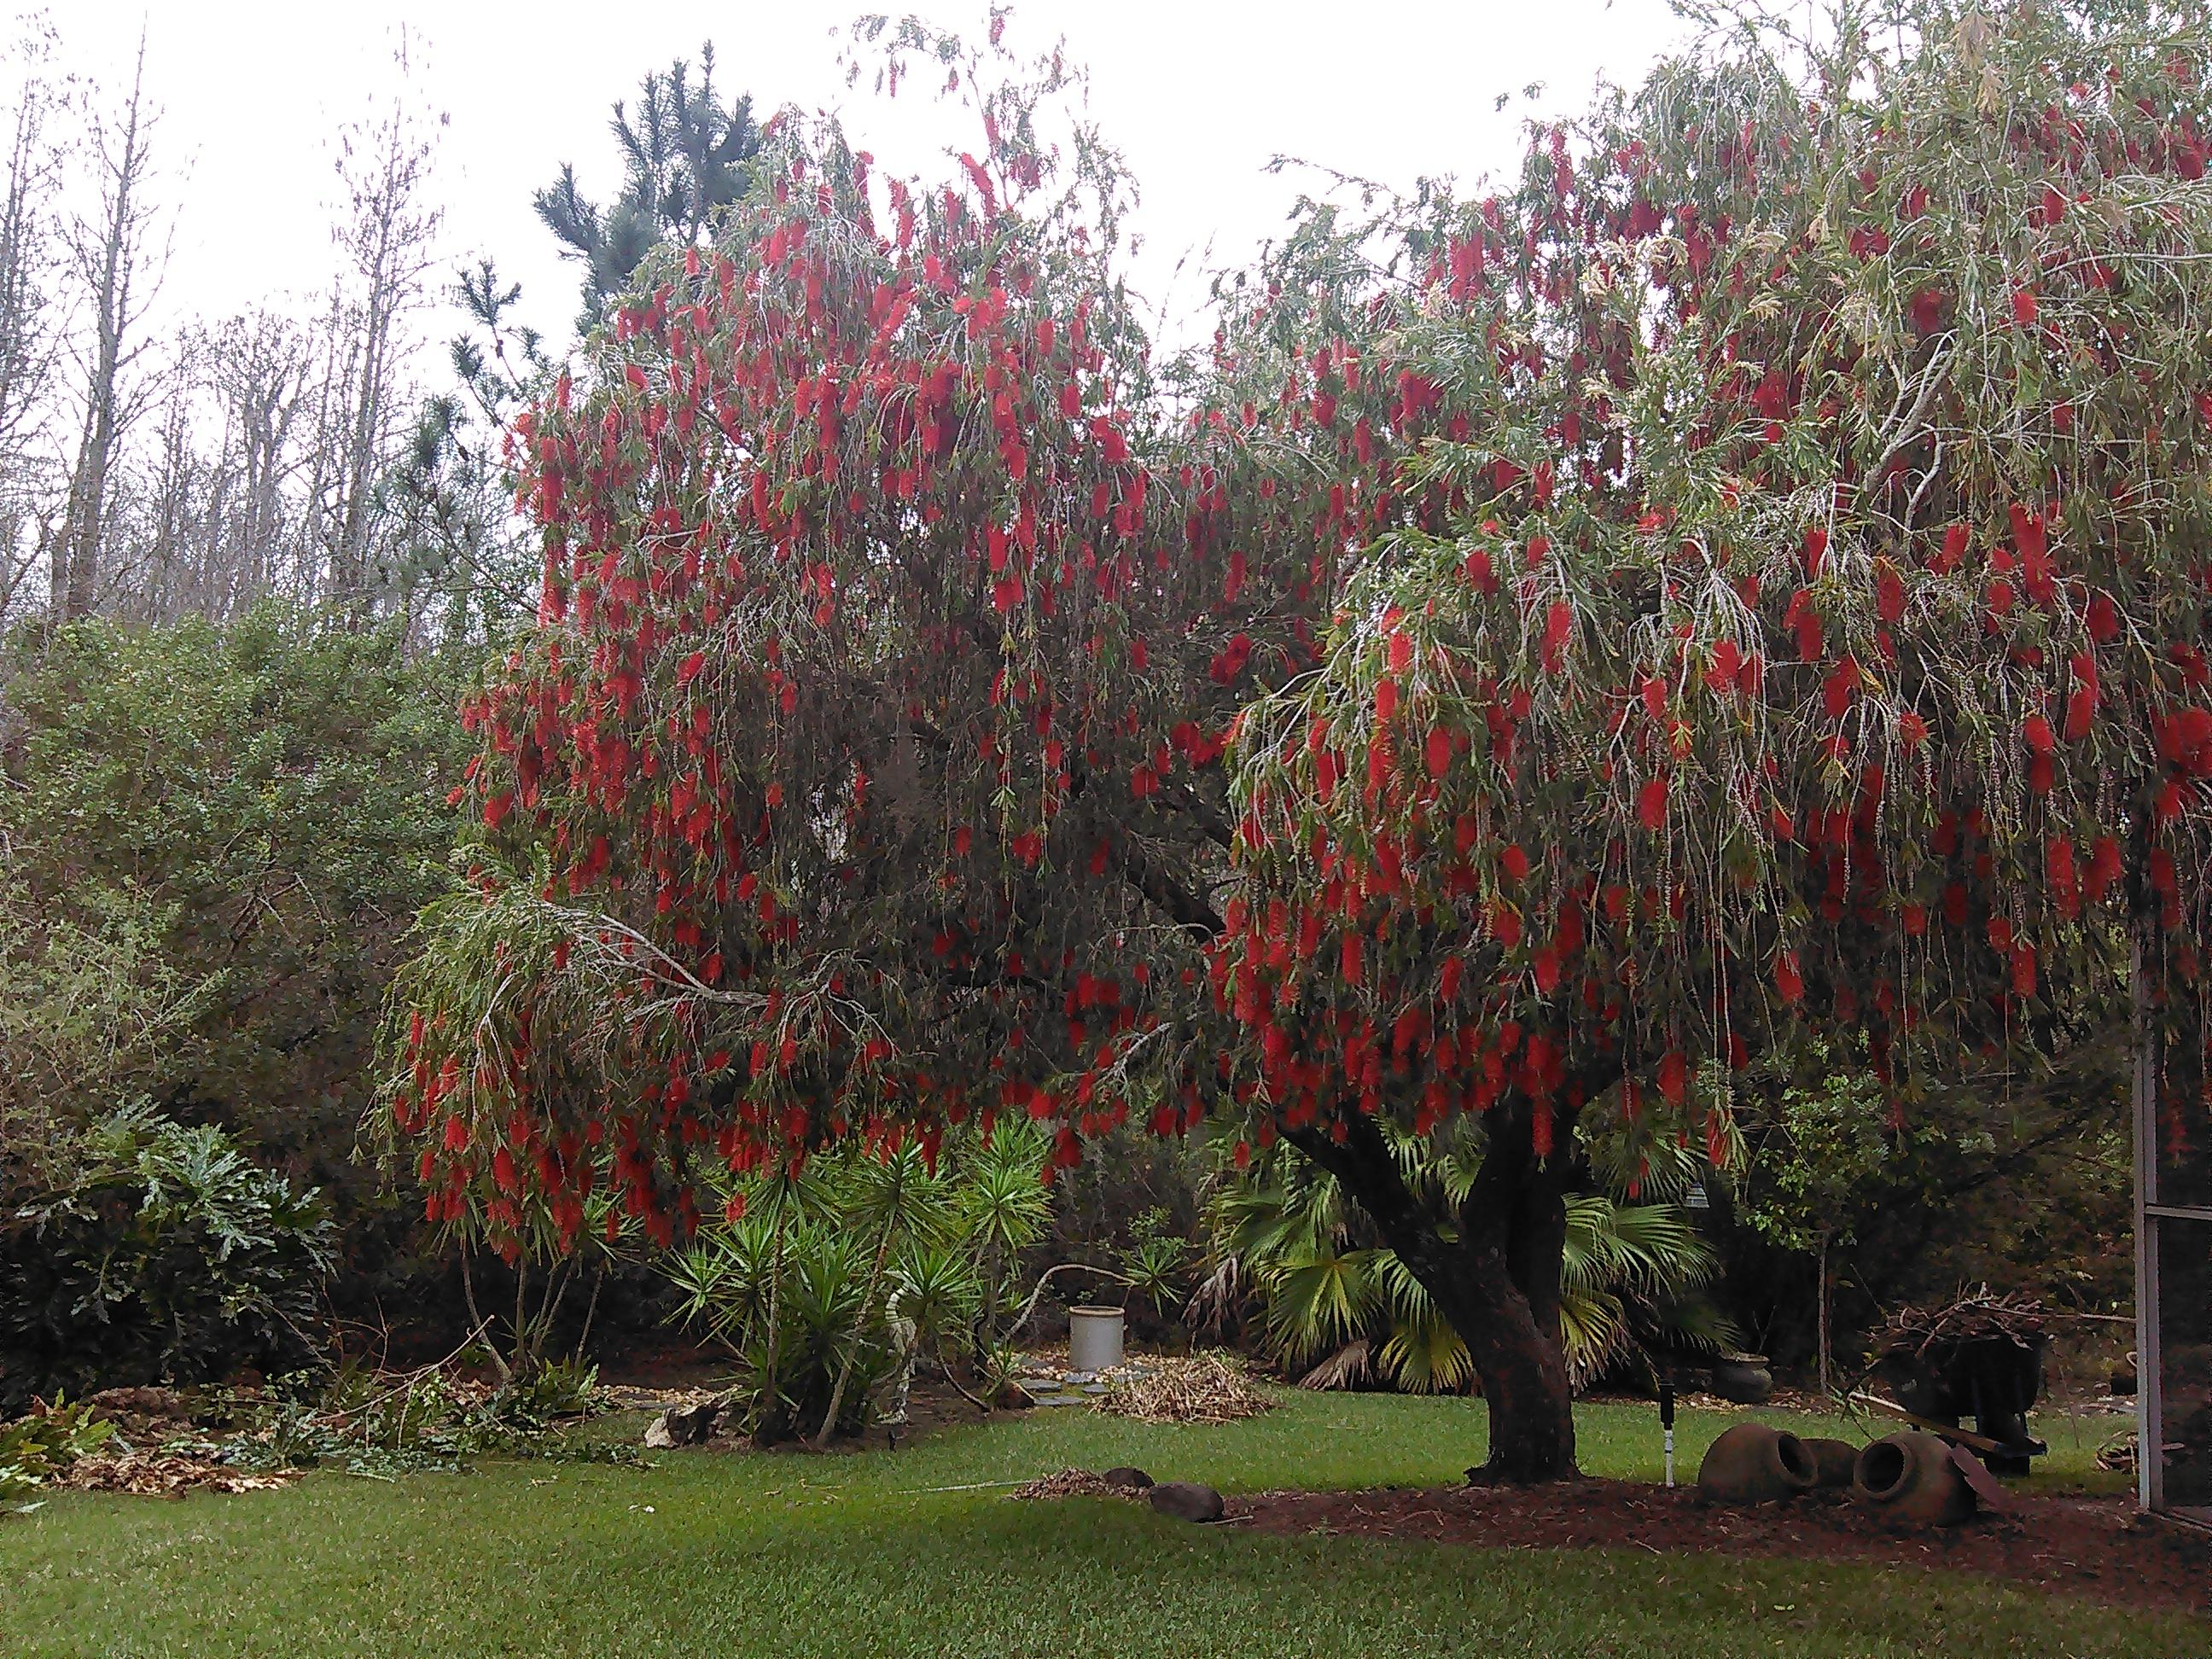 Johns Palms Landscaping image 16